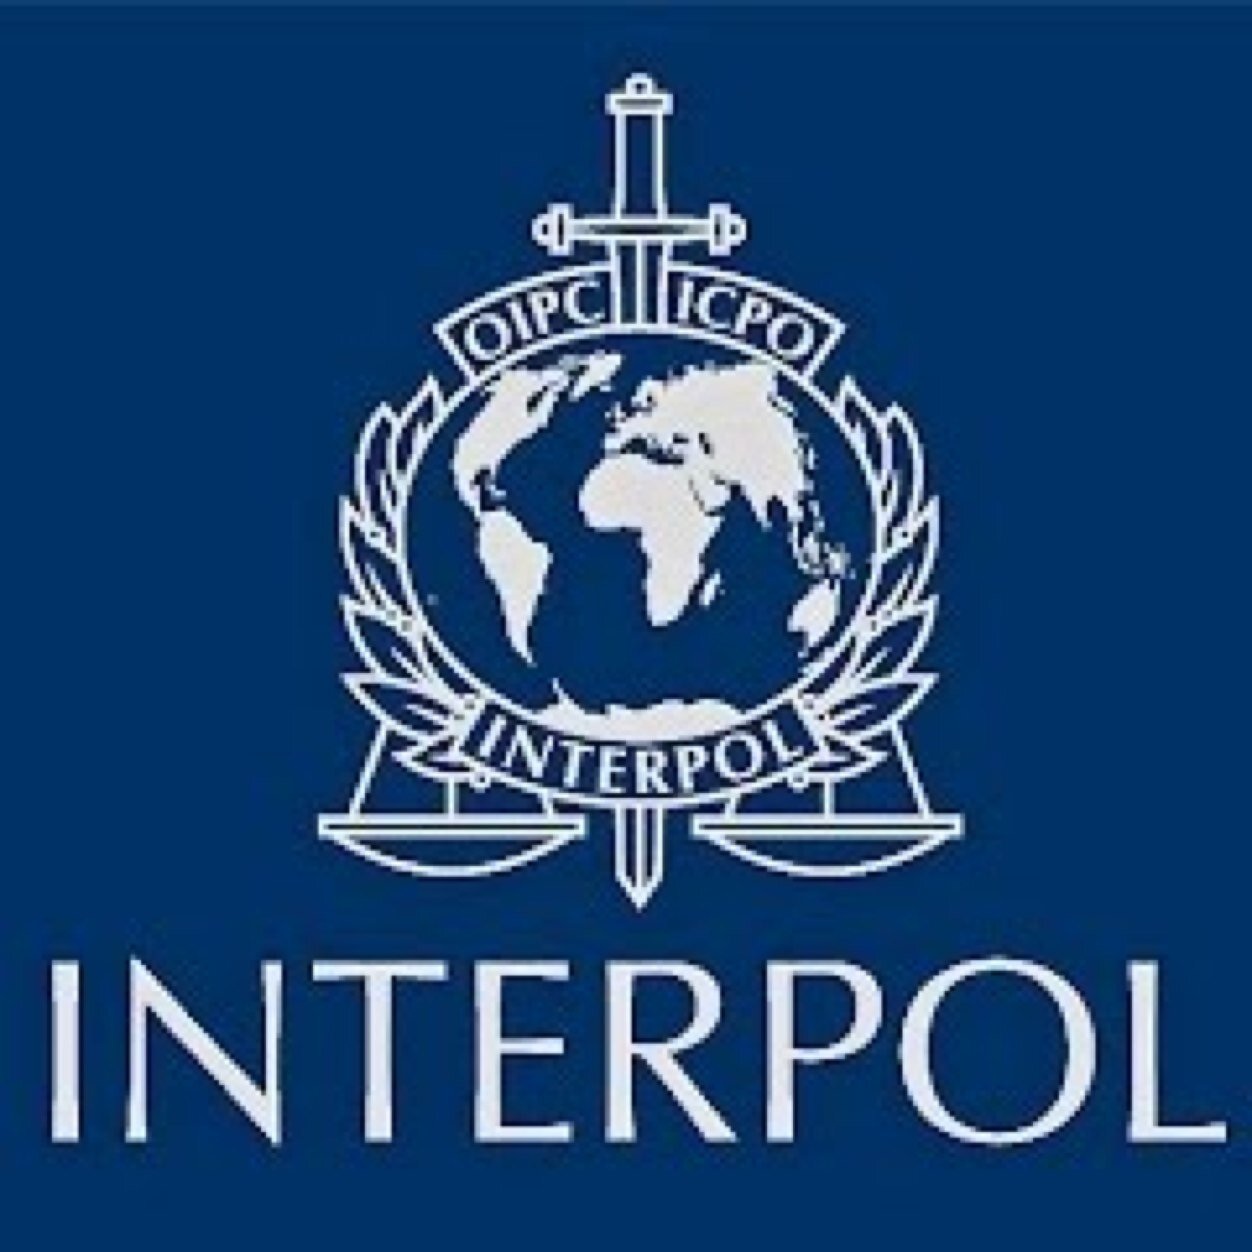 interpol - photo #5